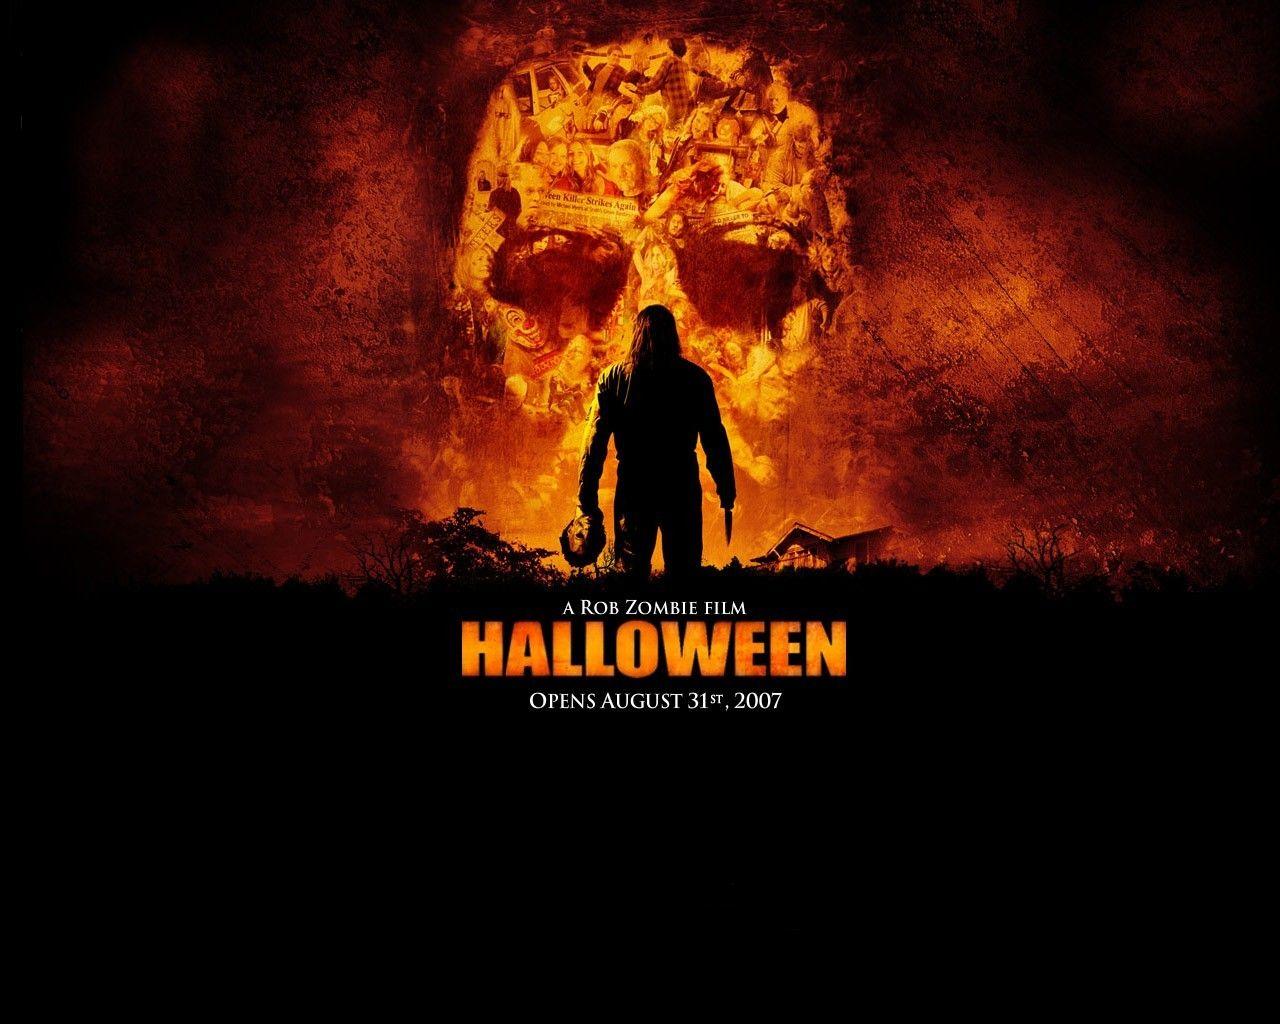 Image detail for  Desktop Wallpapers Movie Halloween 1280x1024